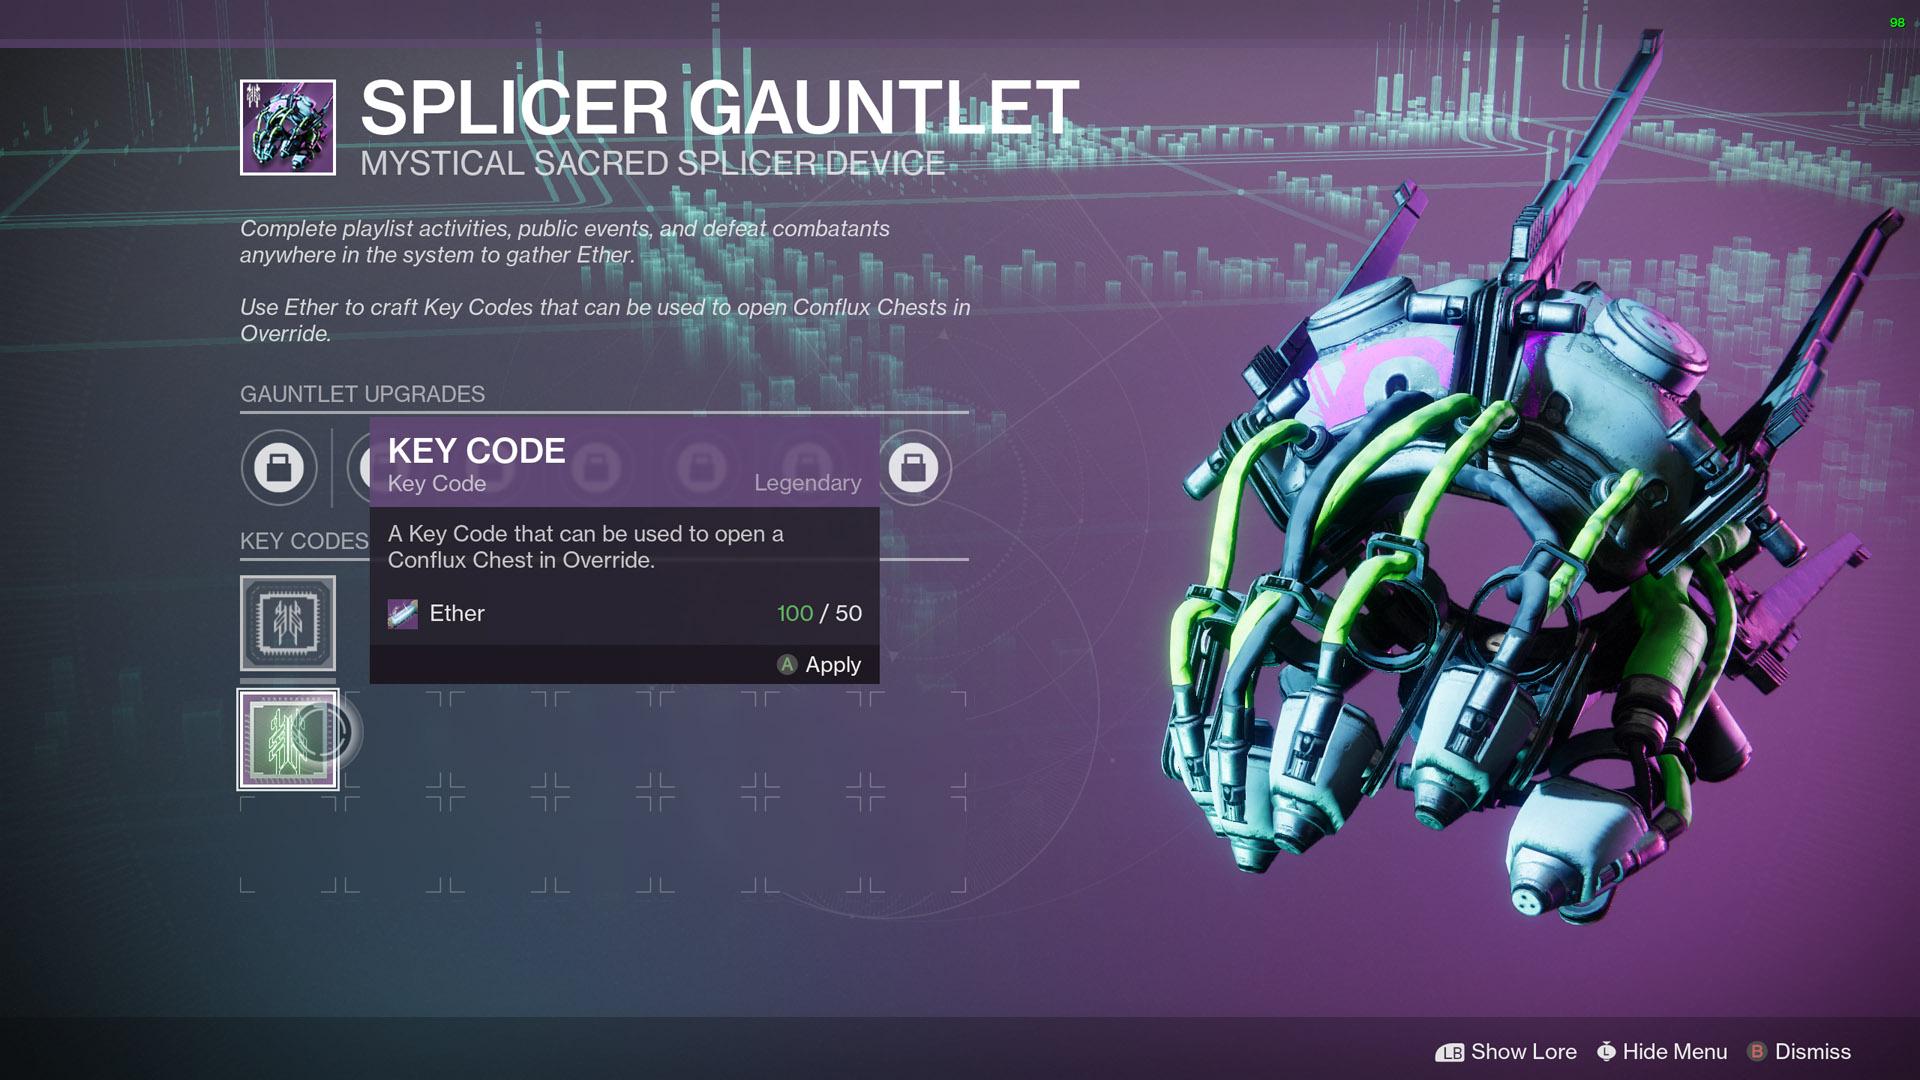 destiny 2 splicer gauntlet key code